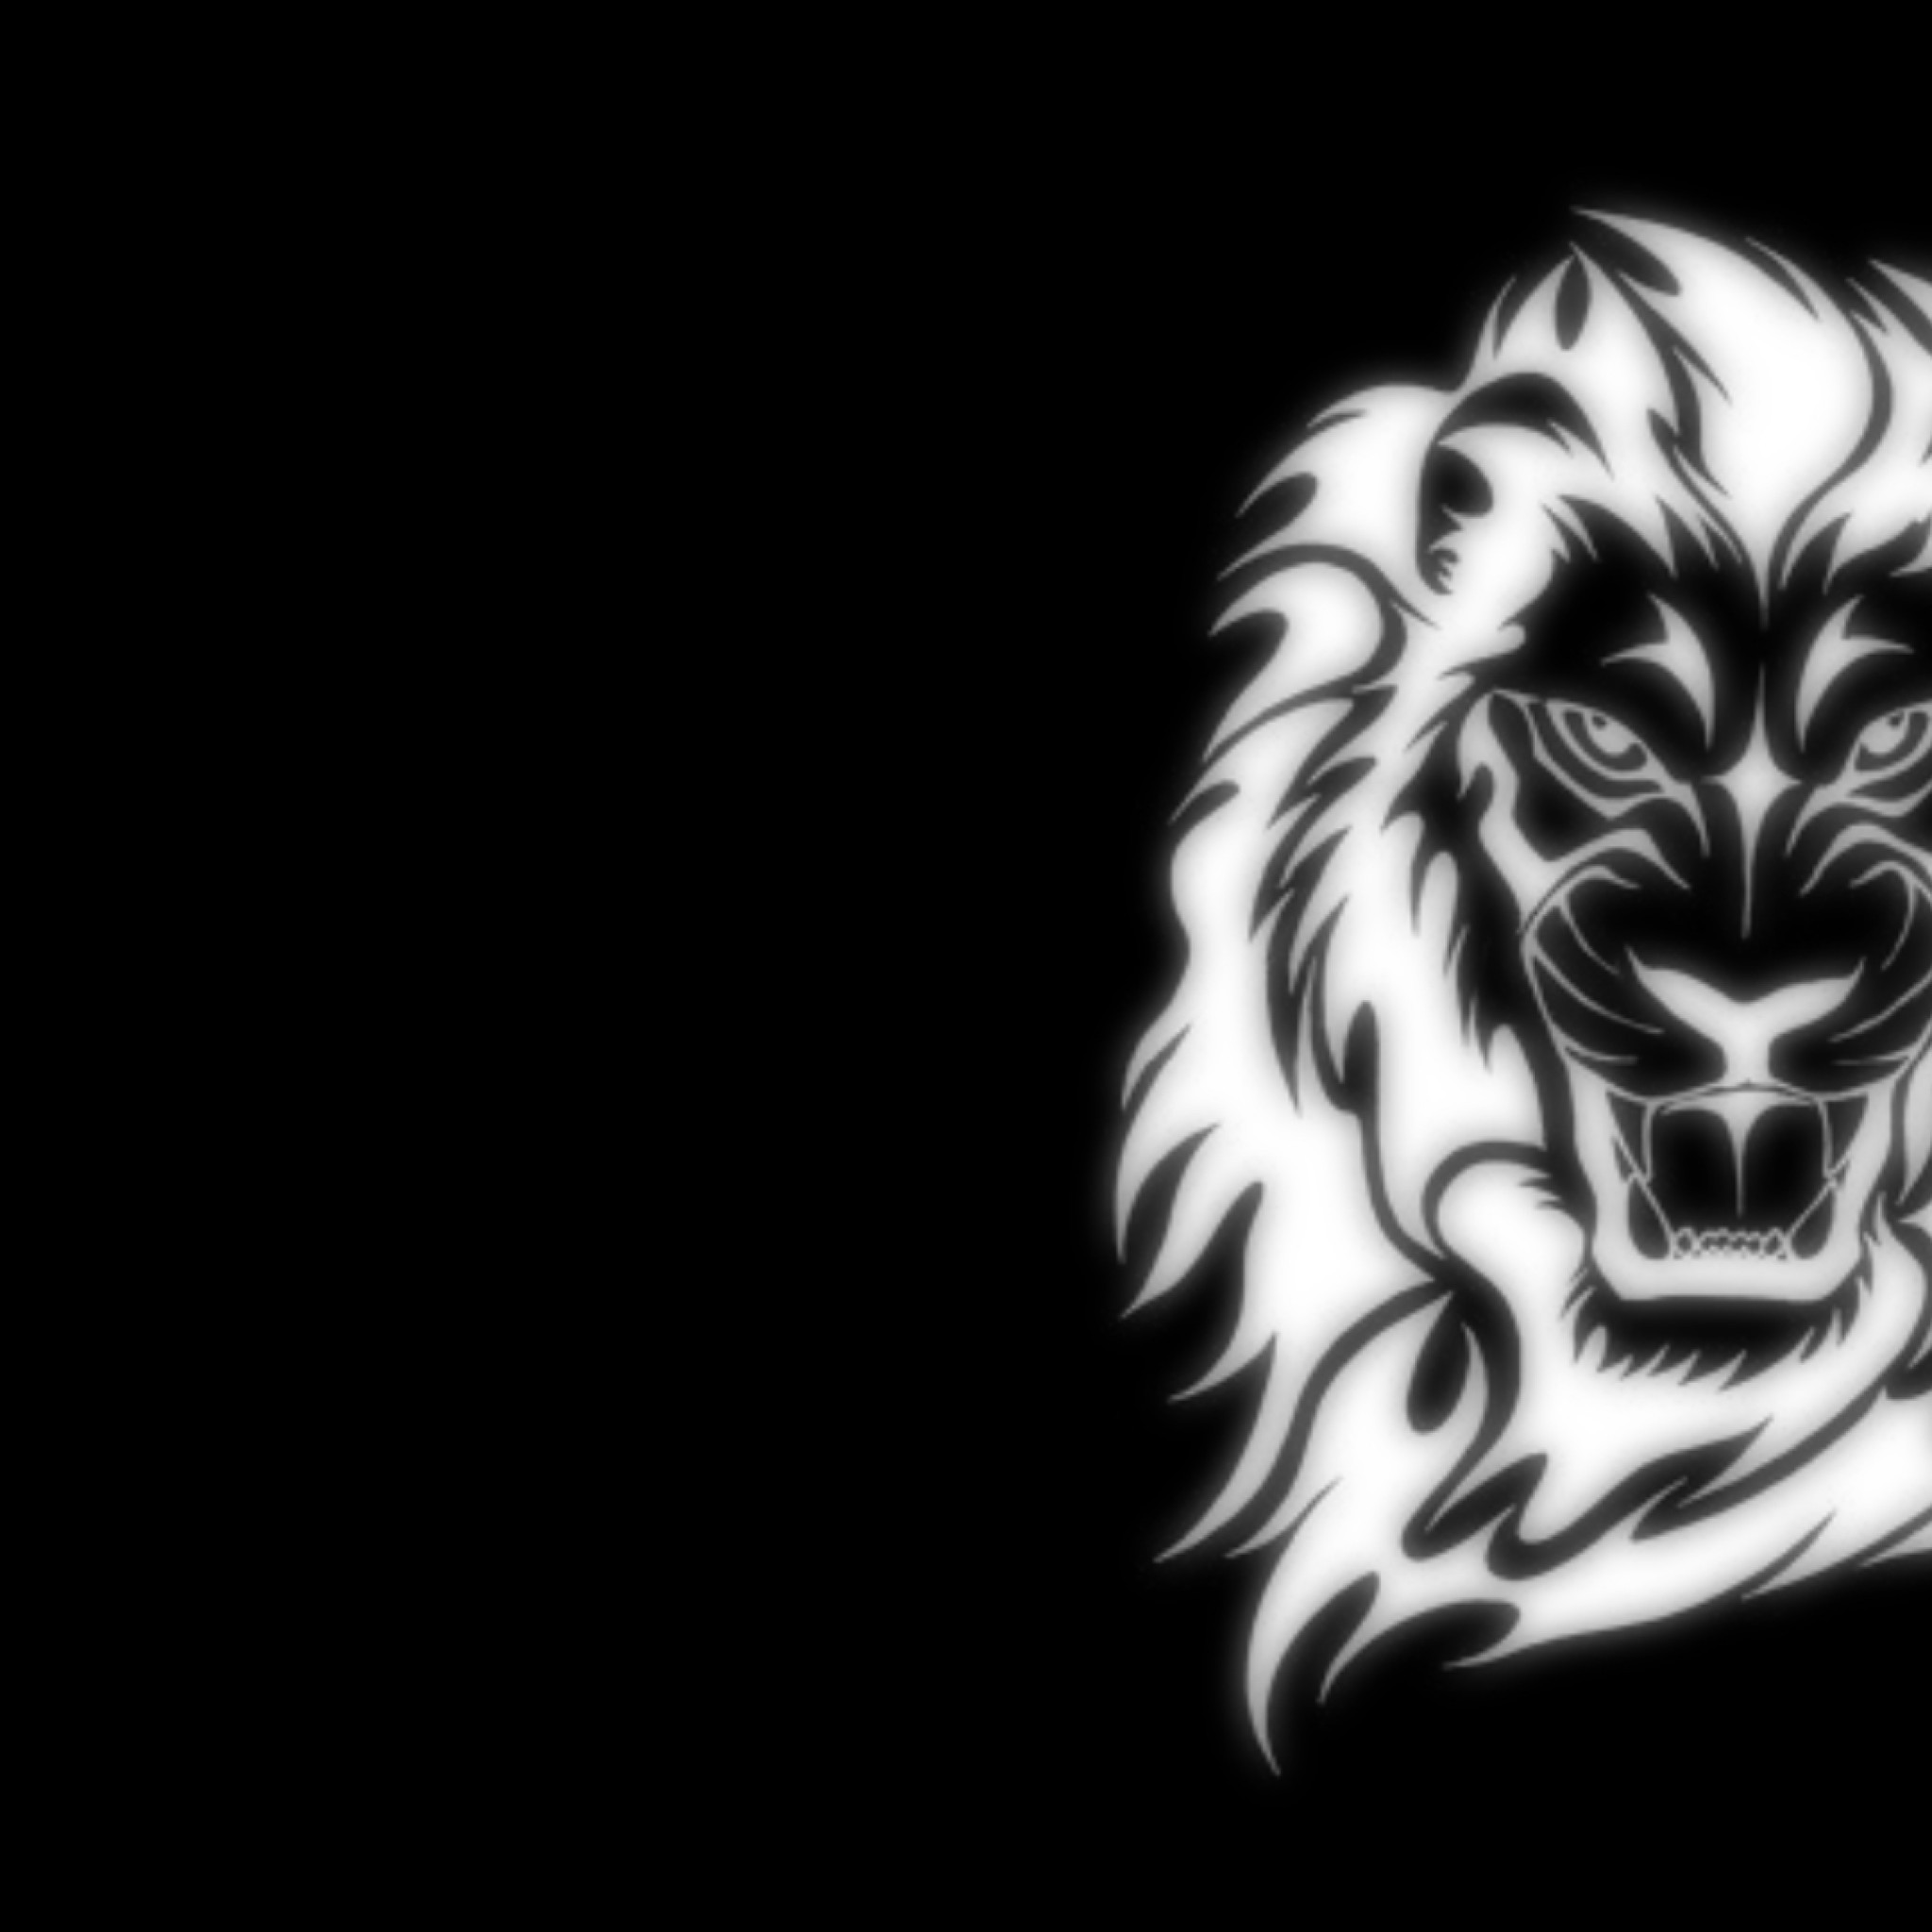 White Lion Iphone X Wallpaper Fitrini S Wallpaper